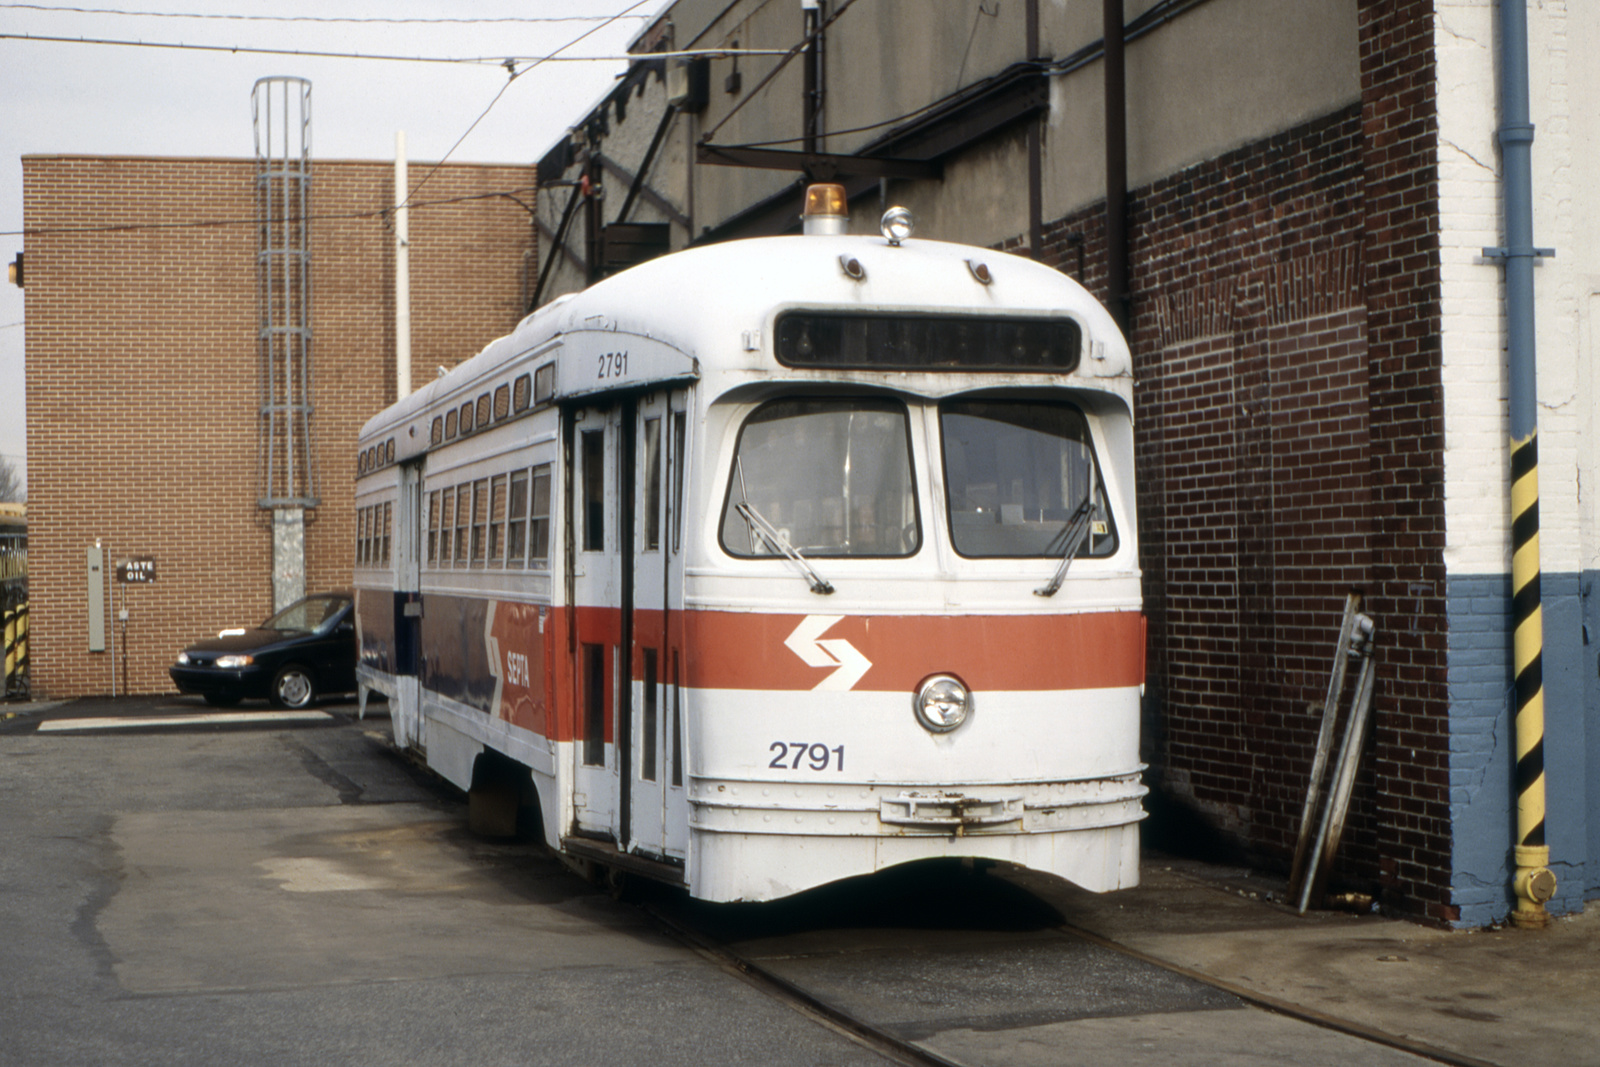 (702k, 1600x1067)<br><b>Country:</b> United States<br><b>City:</b> Philadelphia, PA<br><b>System:</b> SEPTA (or Predecessor)<br><b>Line:</b> Rt. 23-Germantown<br><b>Location:</b> Germantown Depot<br><b>Car:</b> PTC/SEPTA Postwar All-electric PCC (St.Louis, 1947) 2791 <br><b>Collection of:</b> David Pirmann<br><b>Date:</b> 12/1994<br><b>Viewed (this week/total):</b> 0 / 61